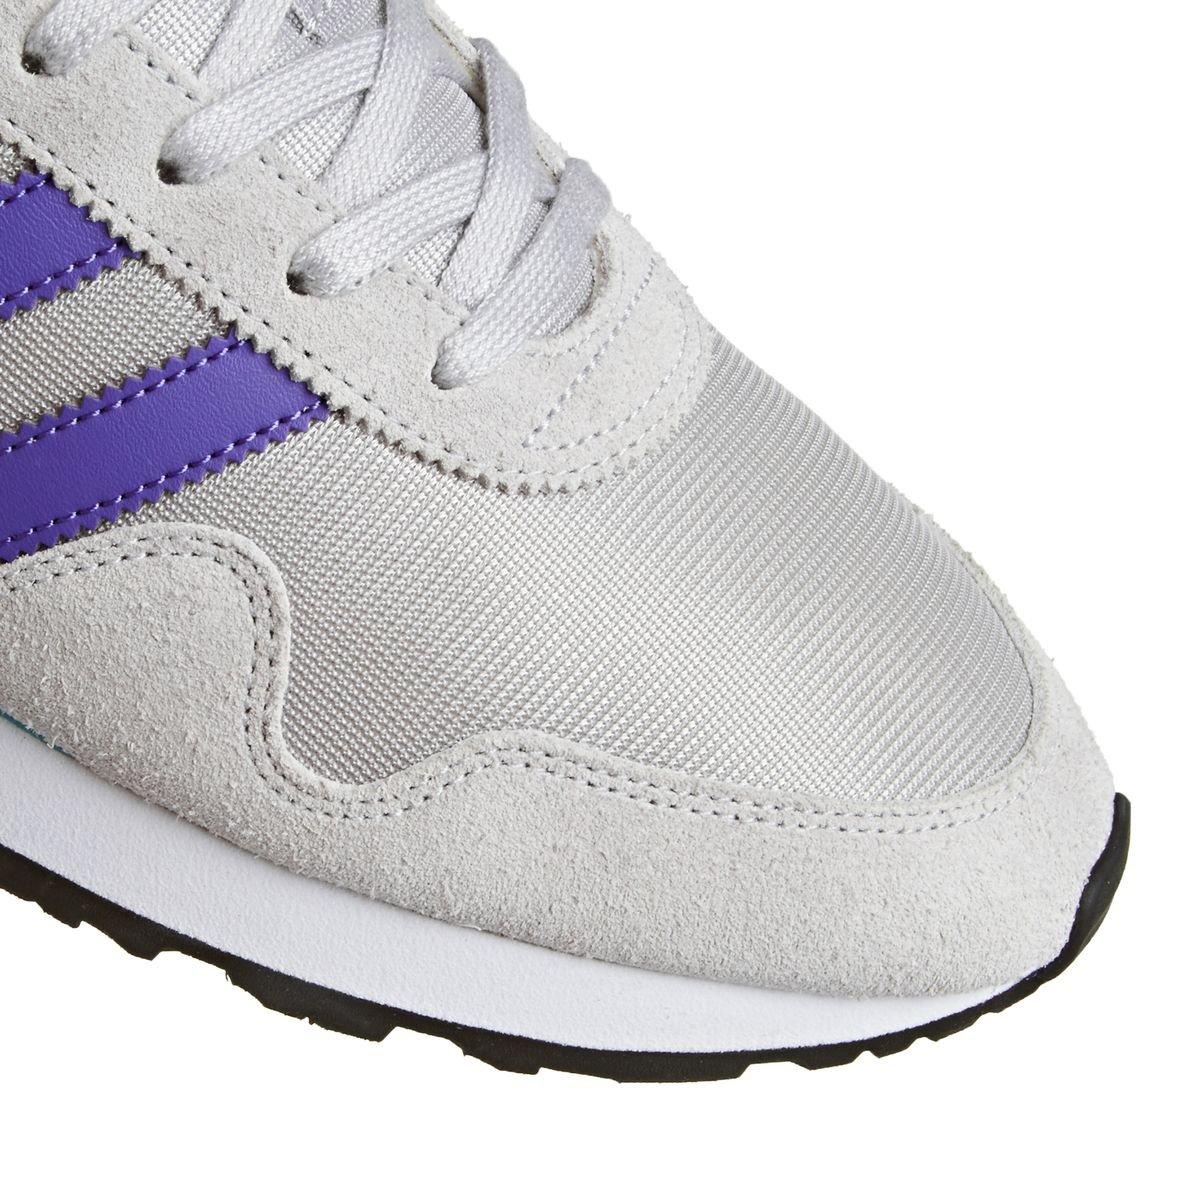 Adidas Haven Trainer Originals Originals Originals Trefoil Unisex Laufschuhe Turnschuhe Sportschuhe Grau Lila a7d501